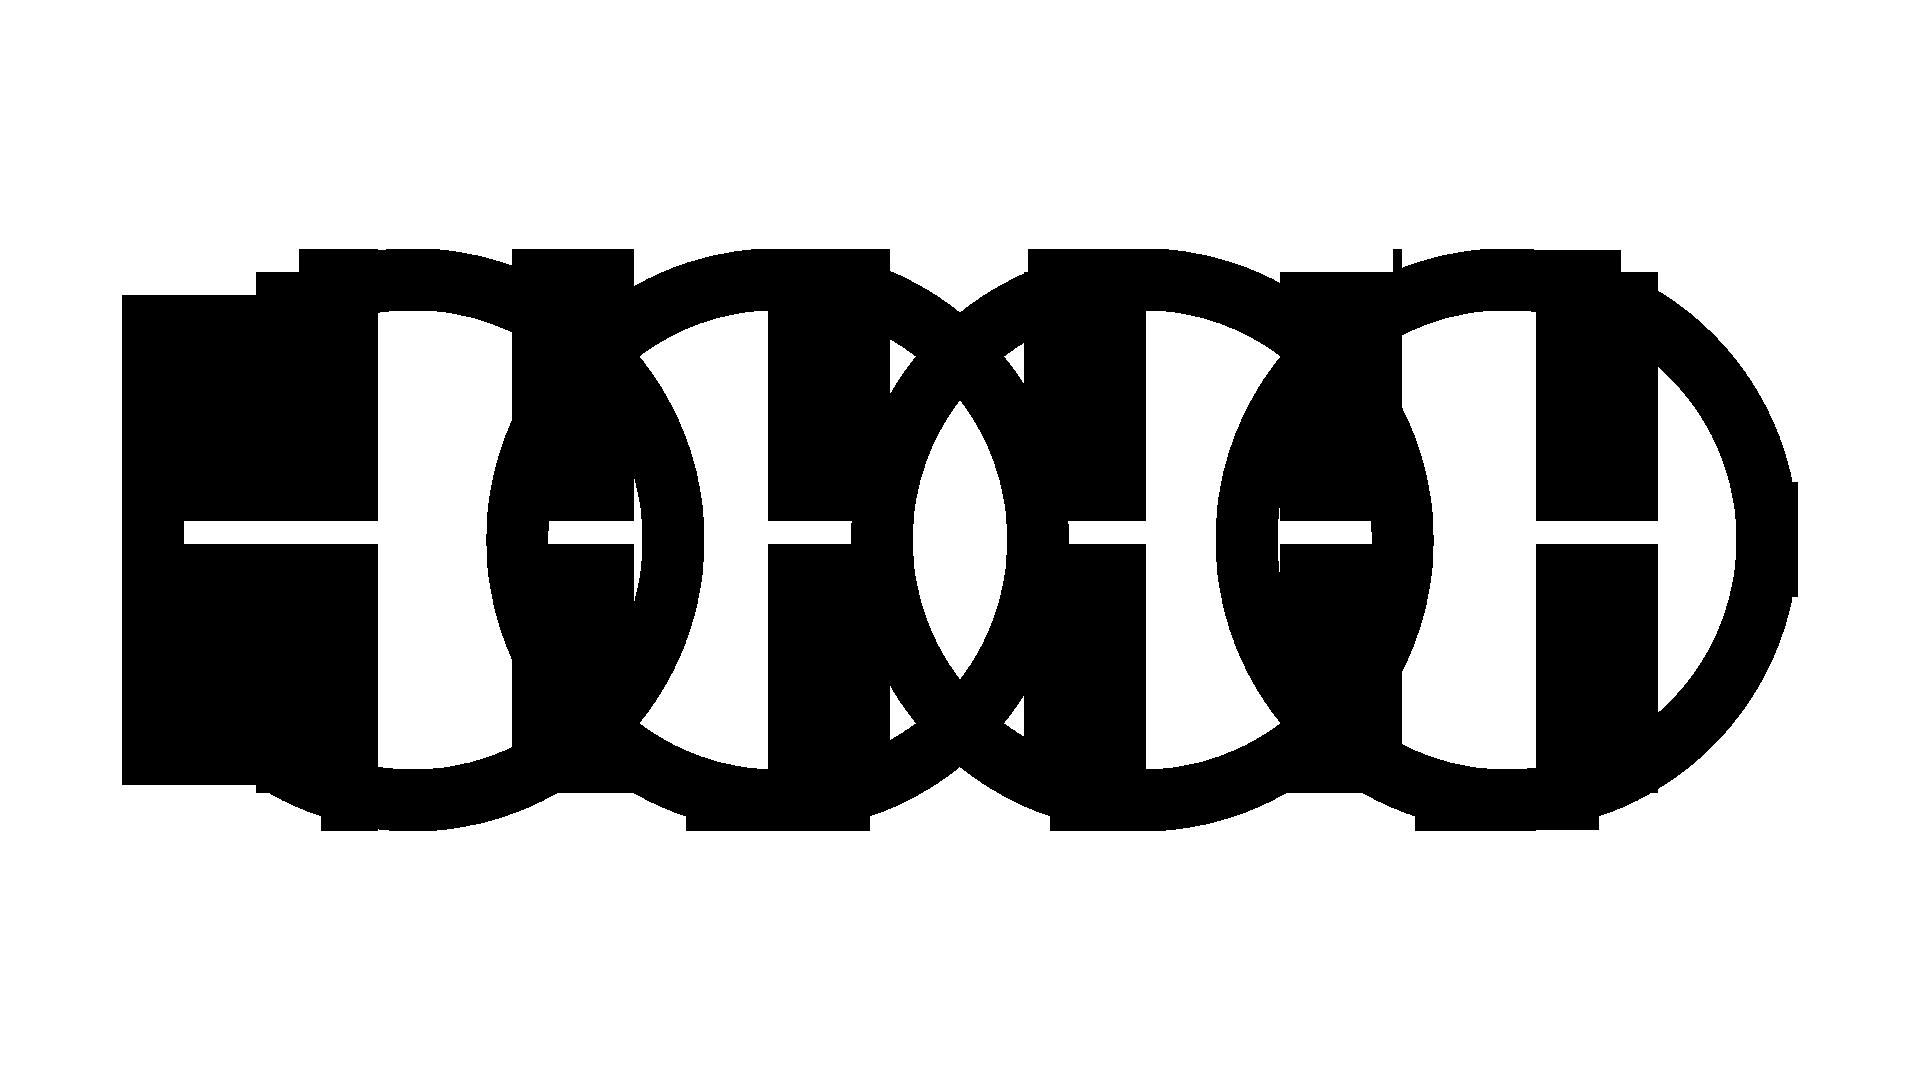 Audi-emblem-2016-black-1920x1080